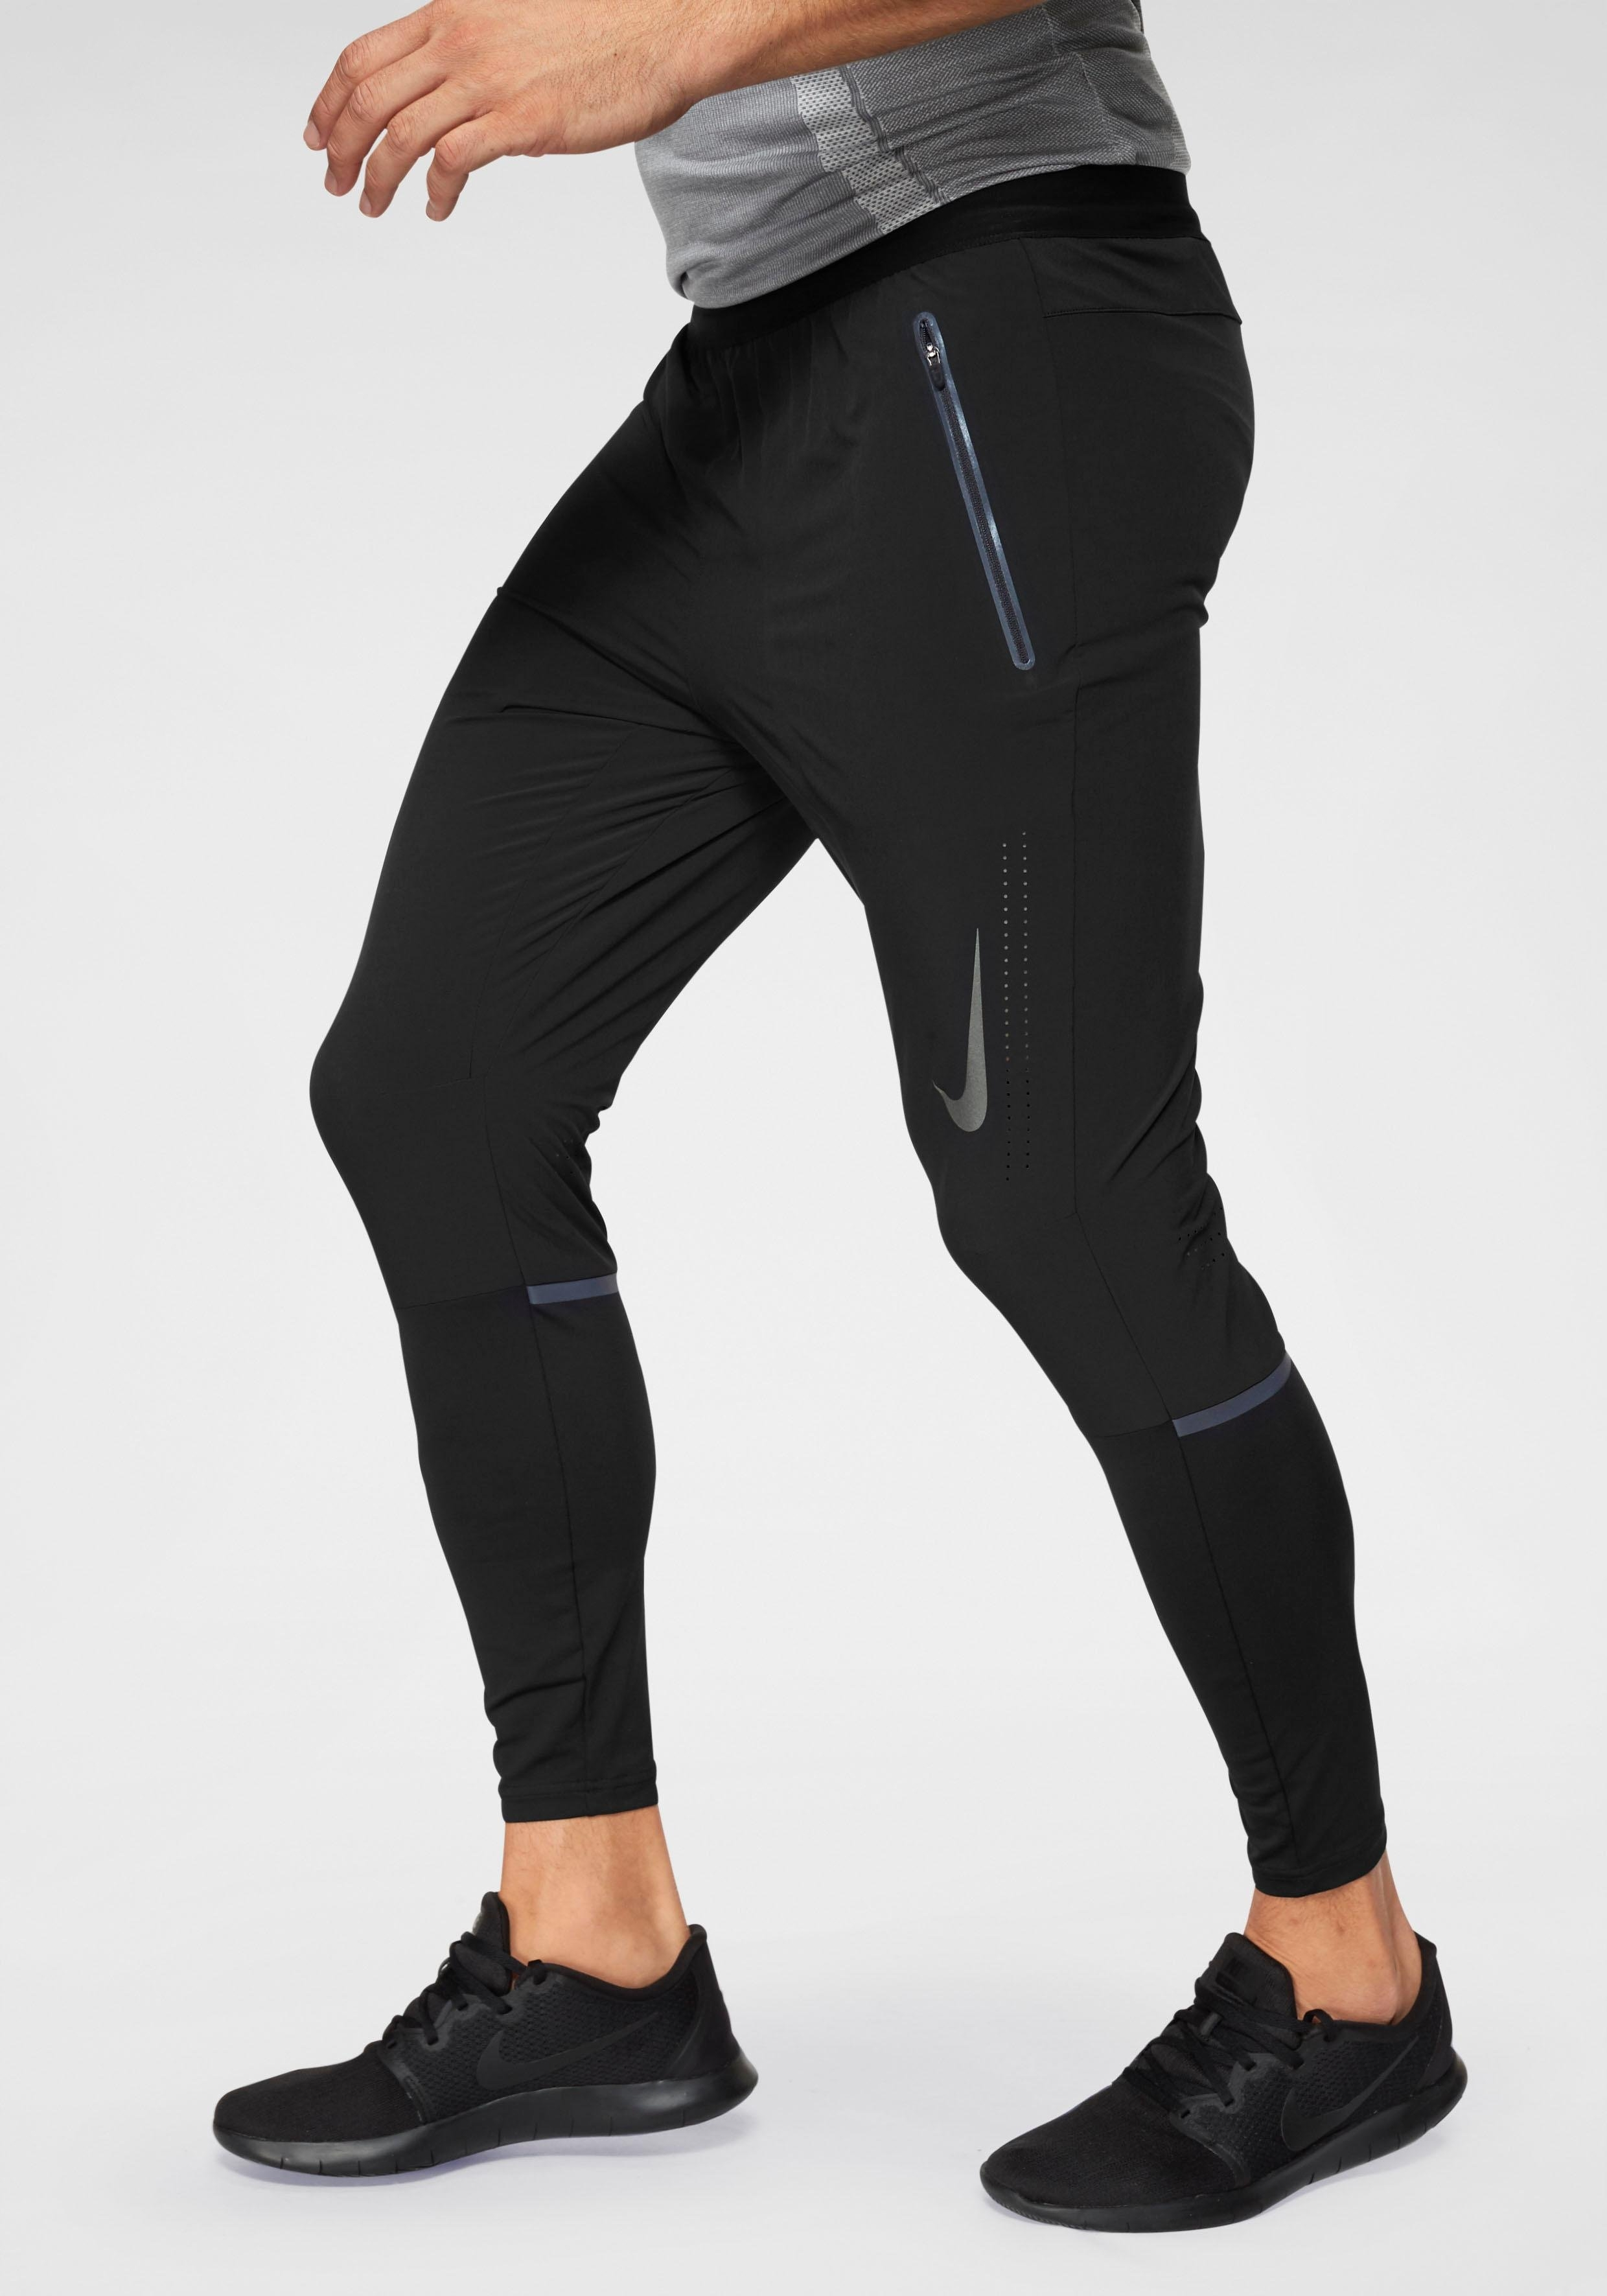 505cdf30227637 Nike runningbroek »M NK SWIFT RUN PANT« snel gevonden | OTTO